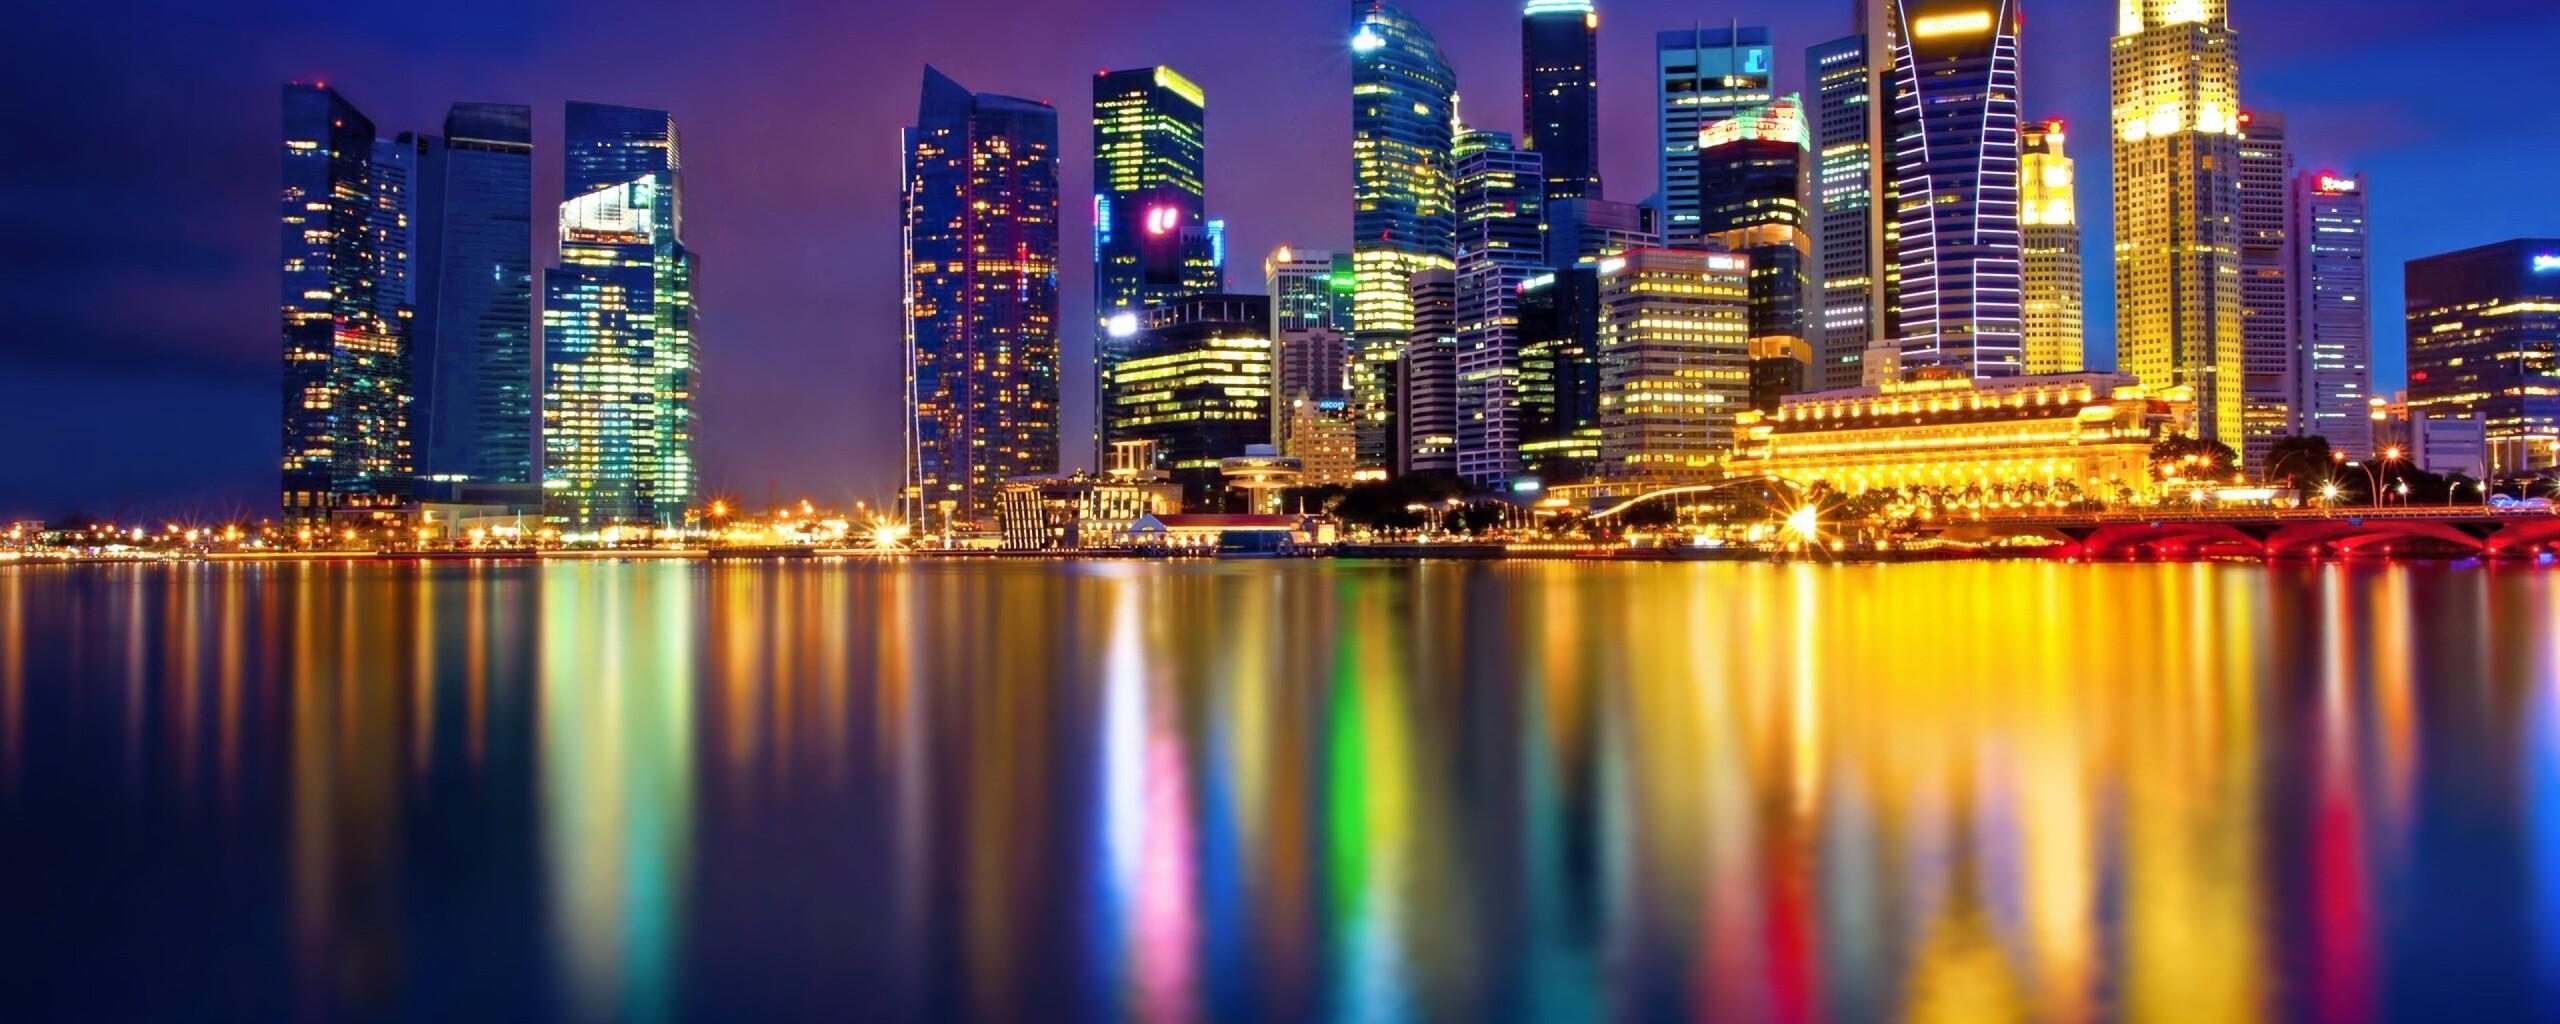 singapore-cityscape-image.jpg